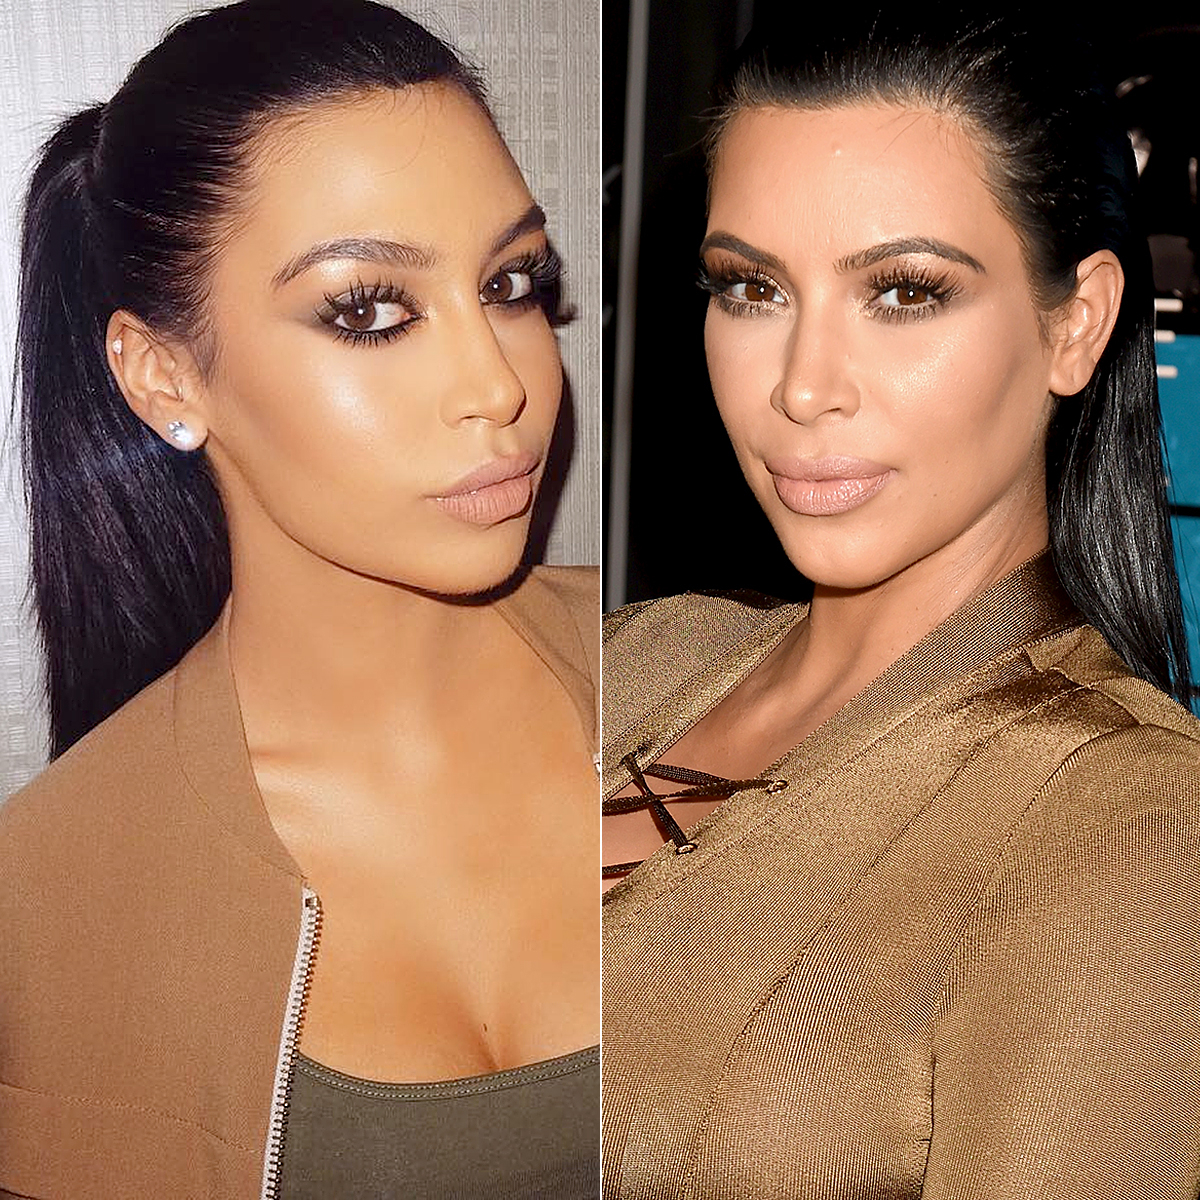 Sonia Ali and Kim Kardashian